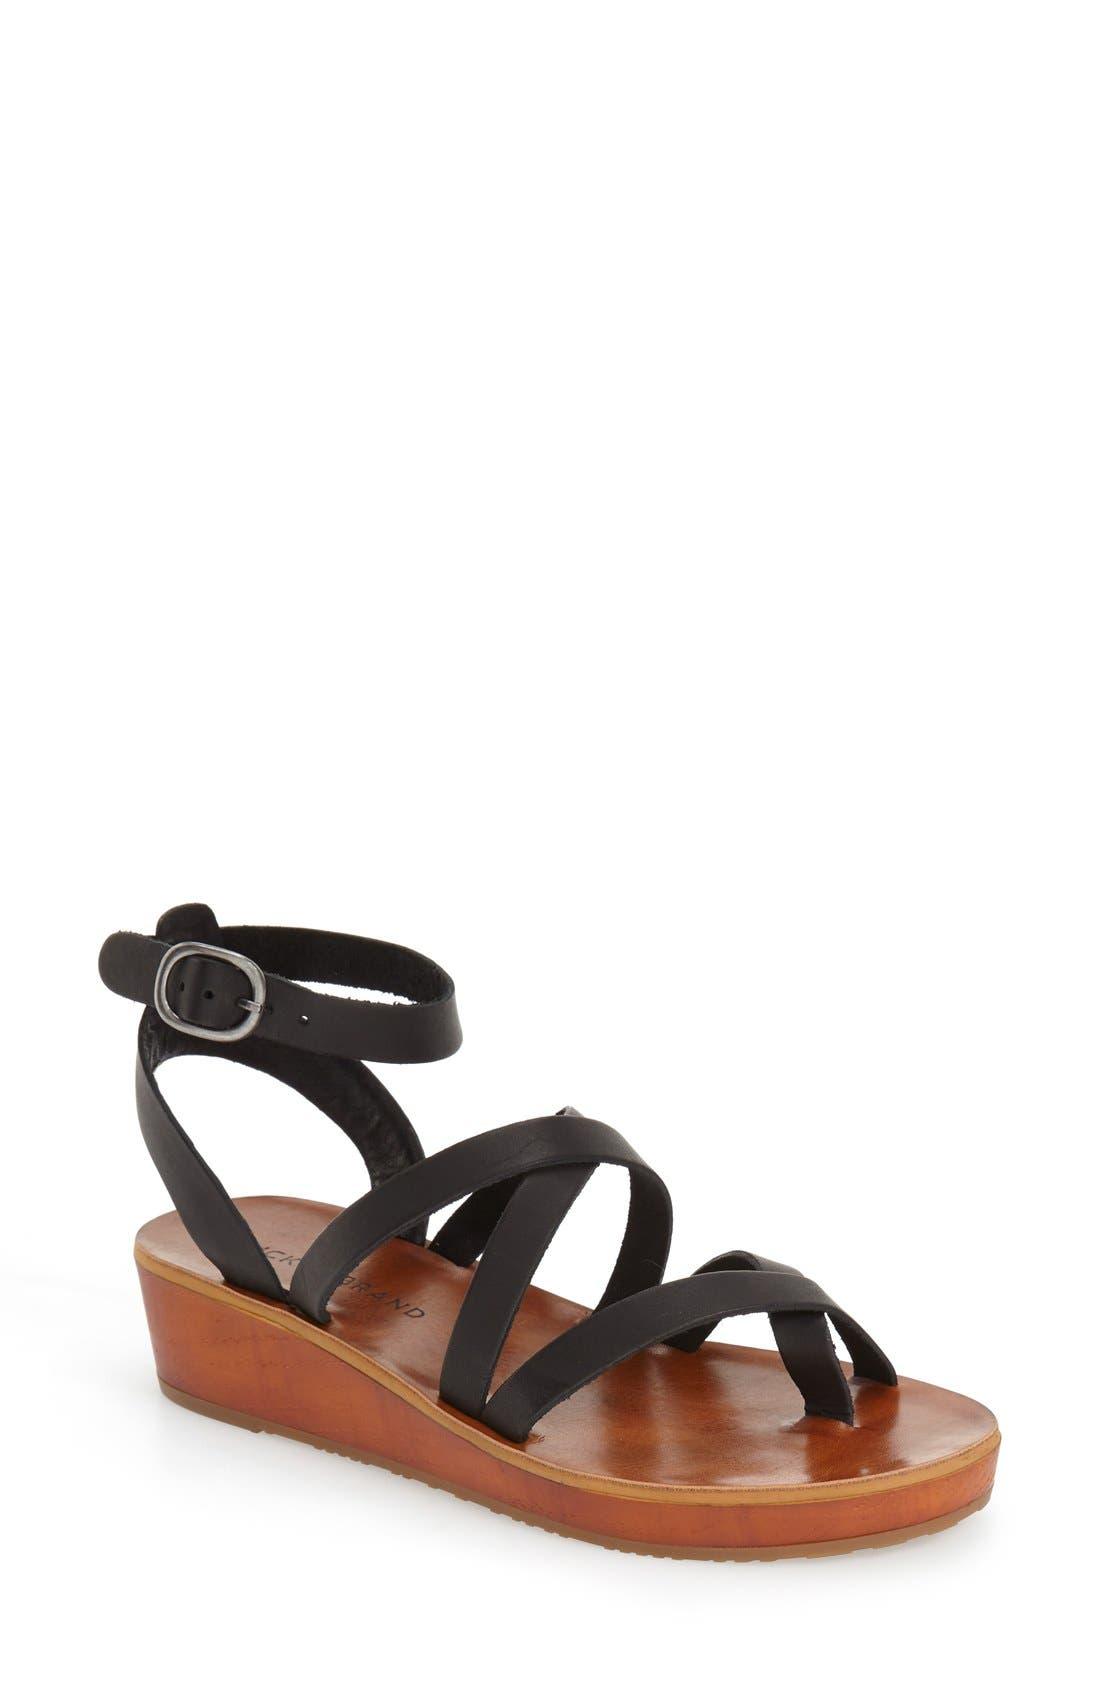 'Honeyy' Platform Sandal,                             Main thumbnail 2, color,